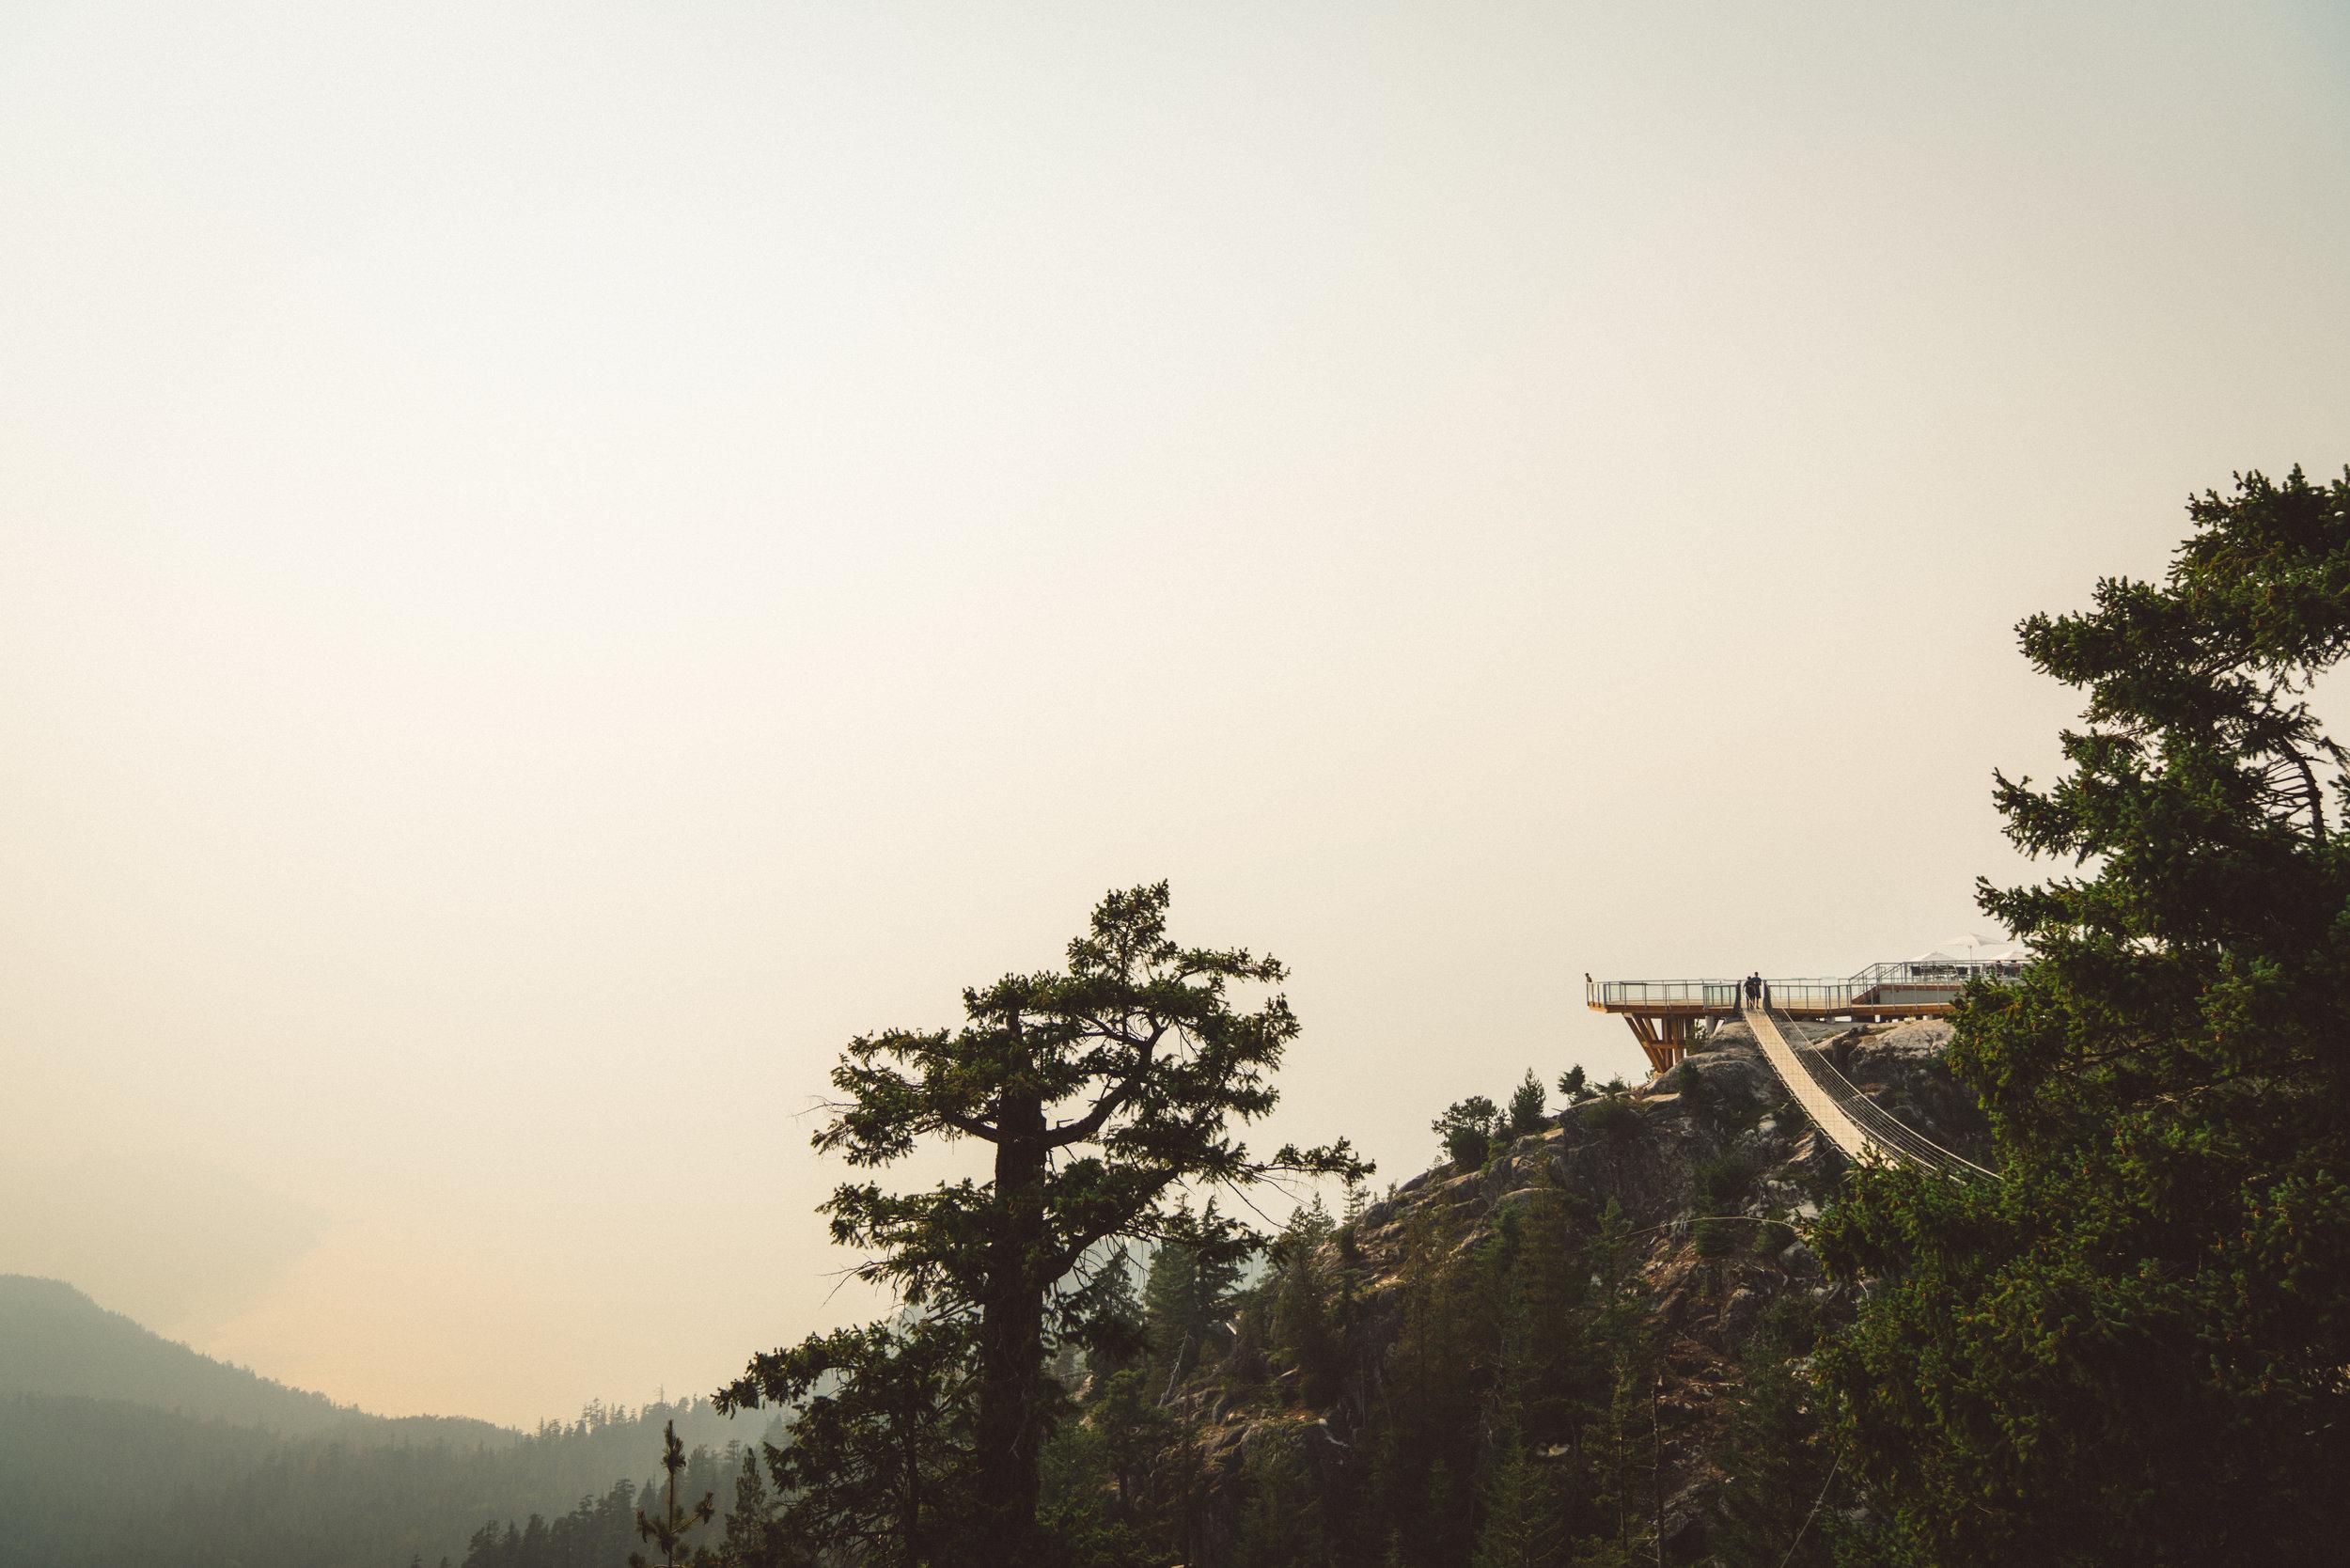 The suspension bridge the Gondala loves to promote.